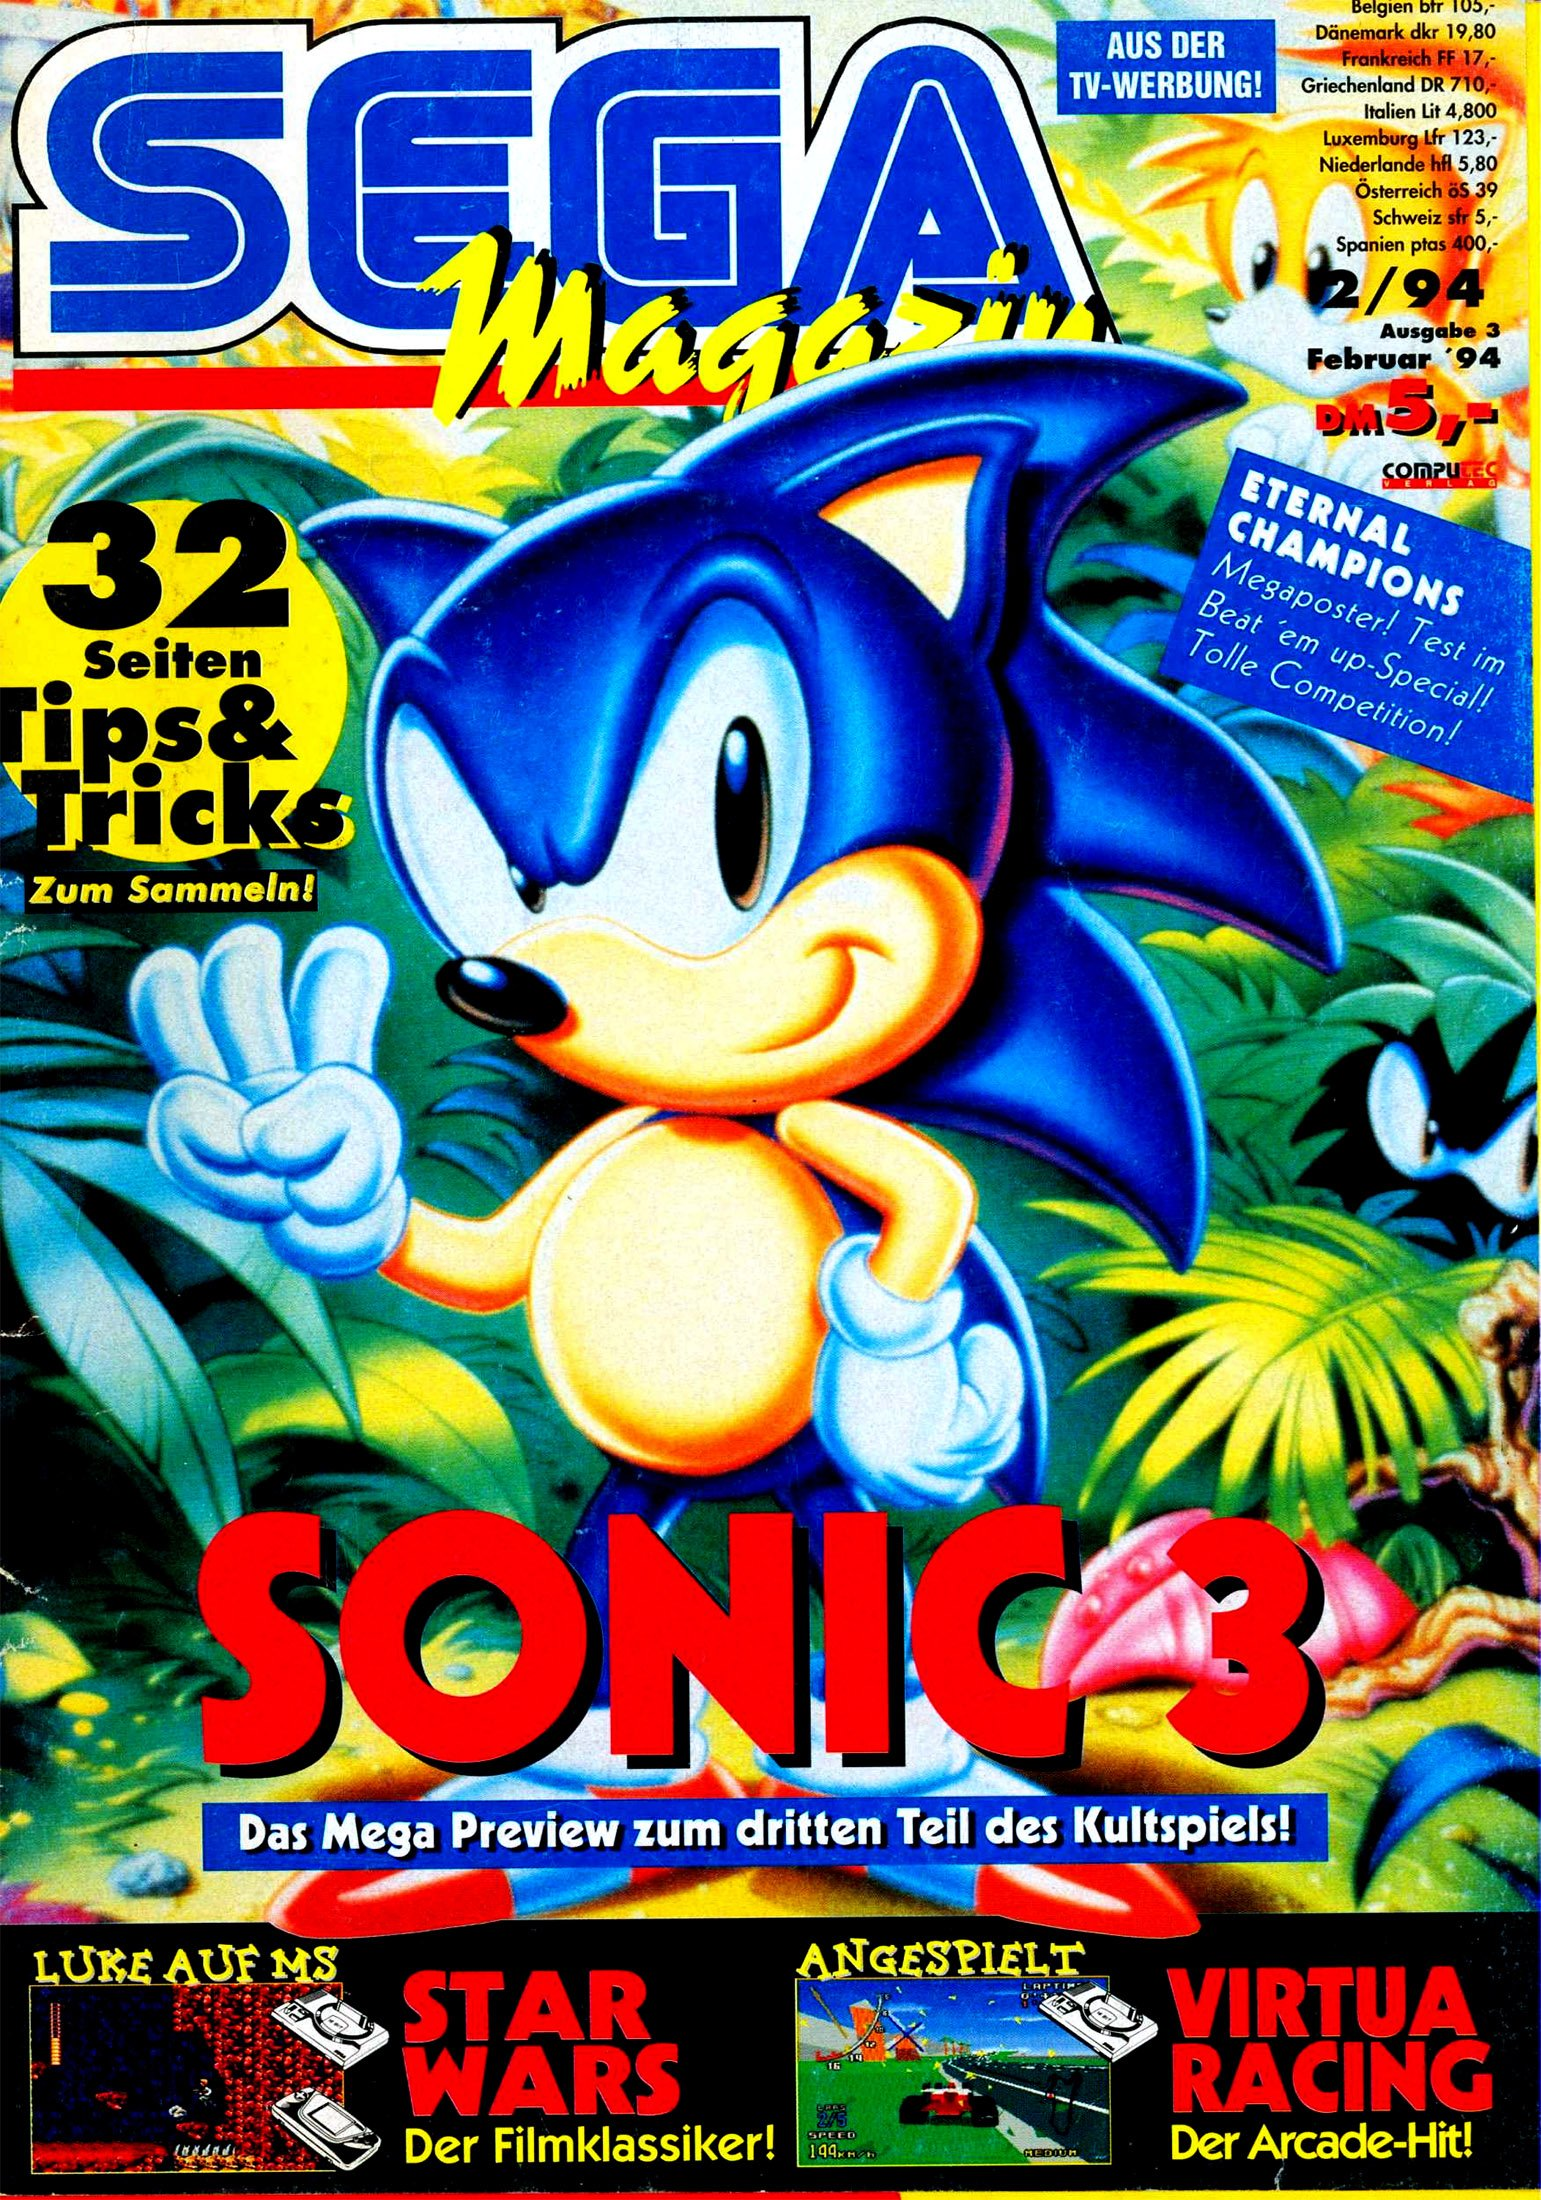 Sega Magazin Issue 03 (February 1994)